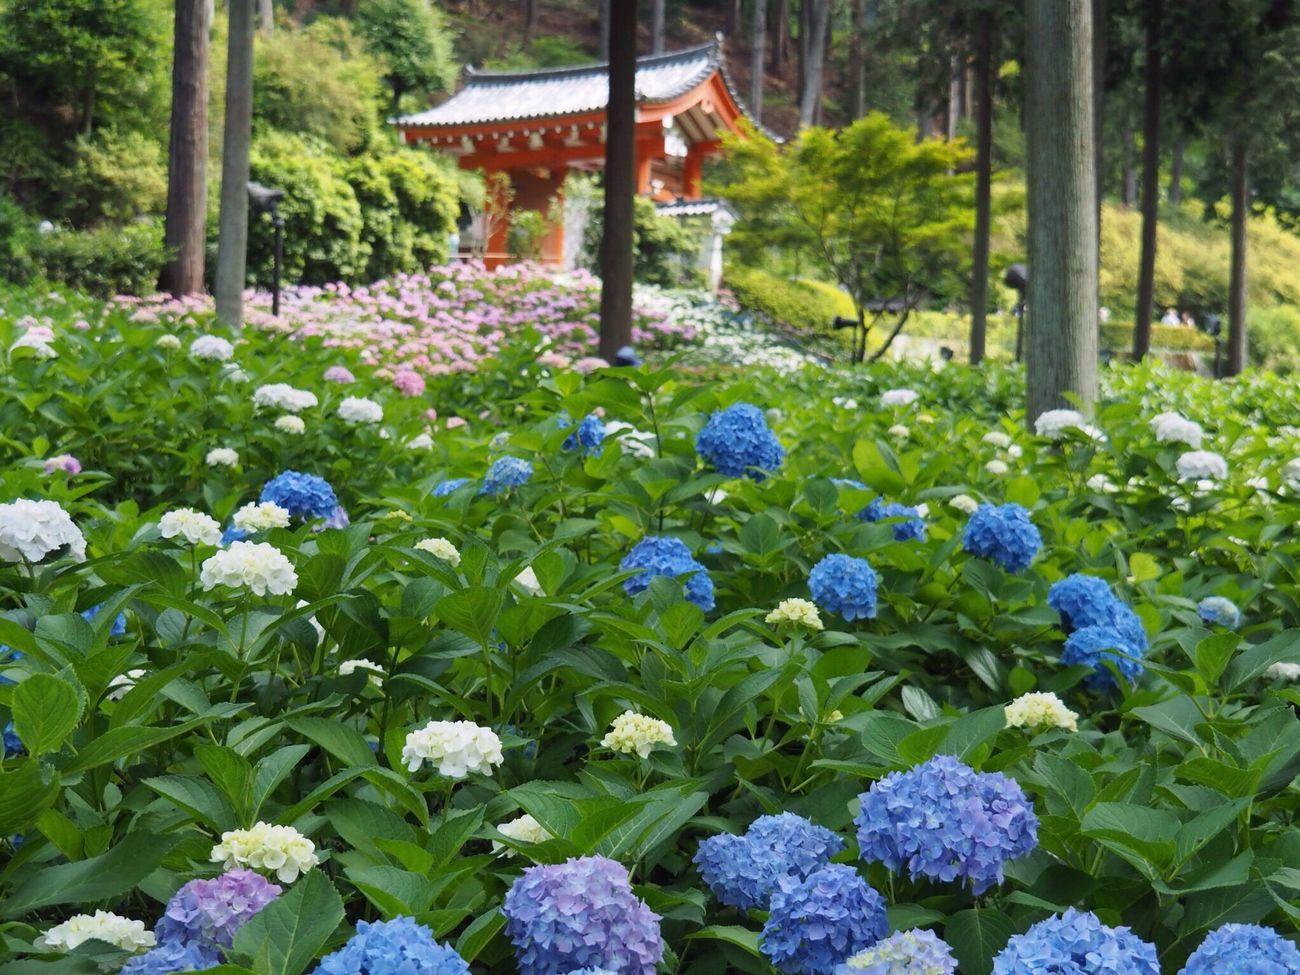 Kyoto Japan Uji Mimurotoji Temple Hydrangea Flower Plant Beauty In Nature Growth Nature Day Outdoors Pink Blue White Purple Olympus PEN-F 京都 日本 宇治 三室戸寺 紫陽花 10,000株の紫陽花